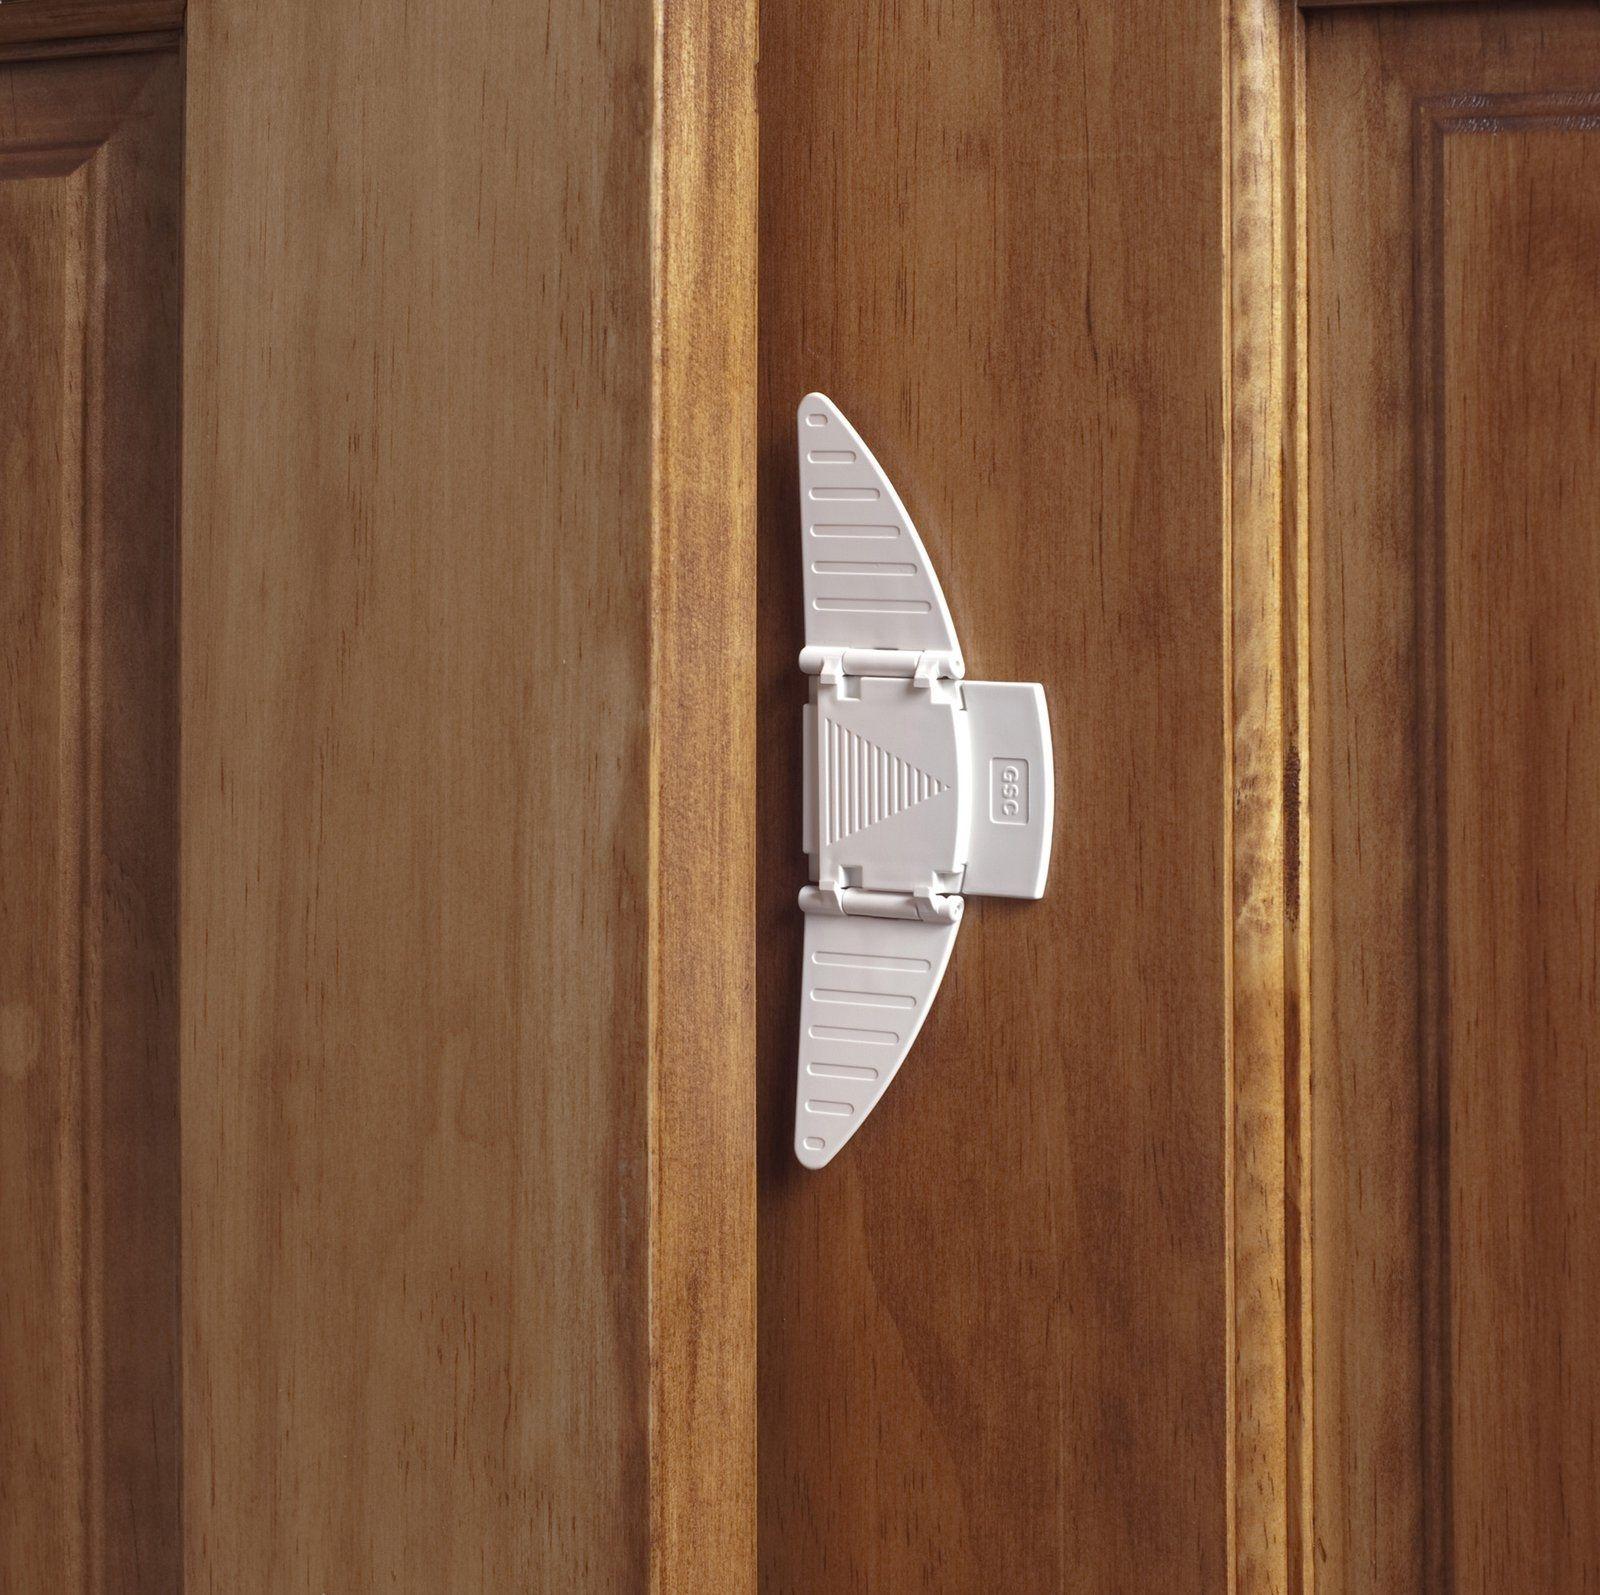 Sliding Wood Closet Doors Lock Httpsourceabl Pinterest